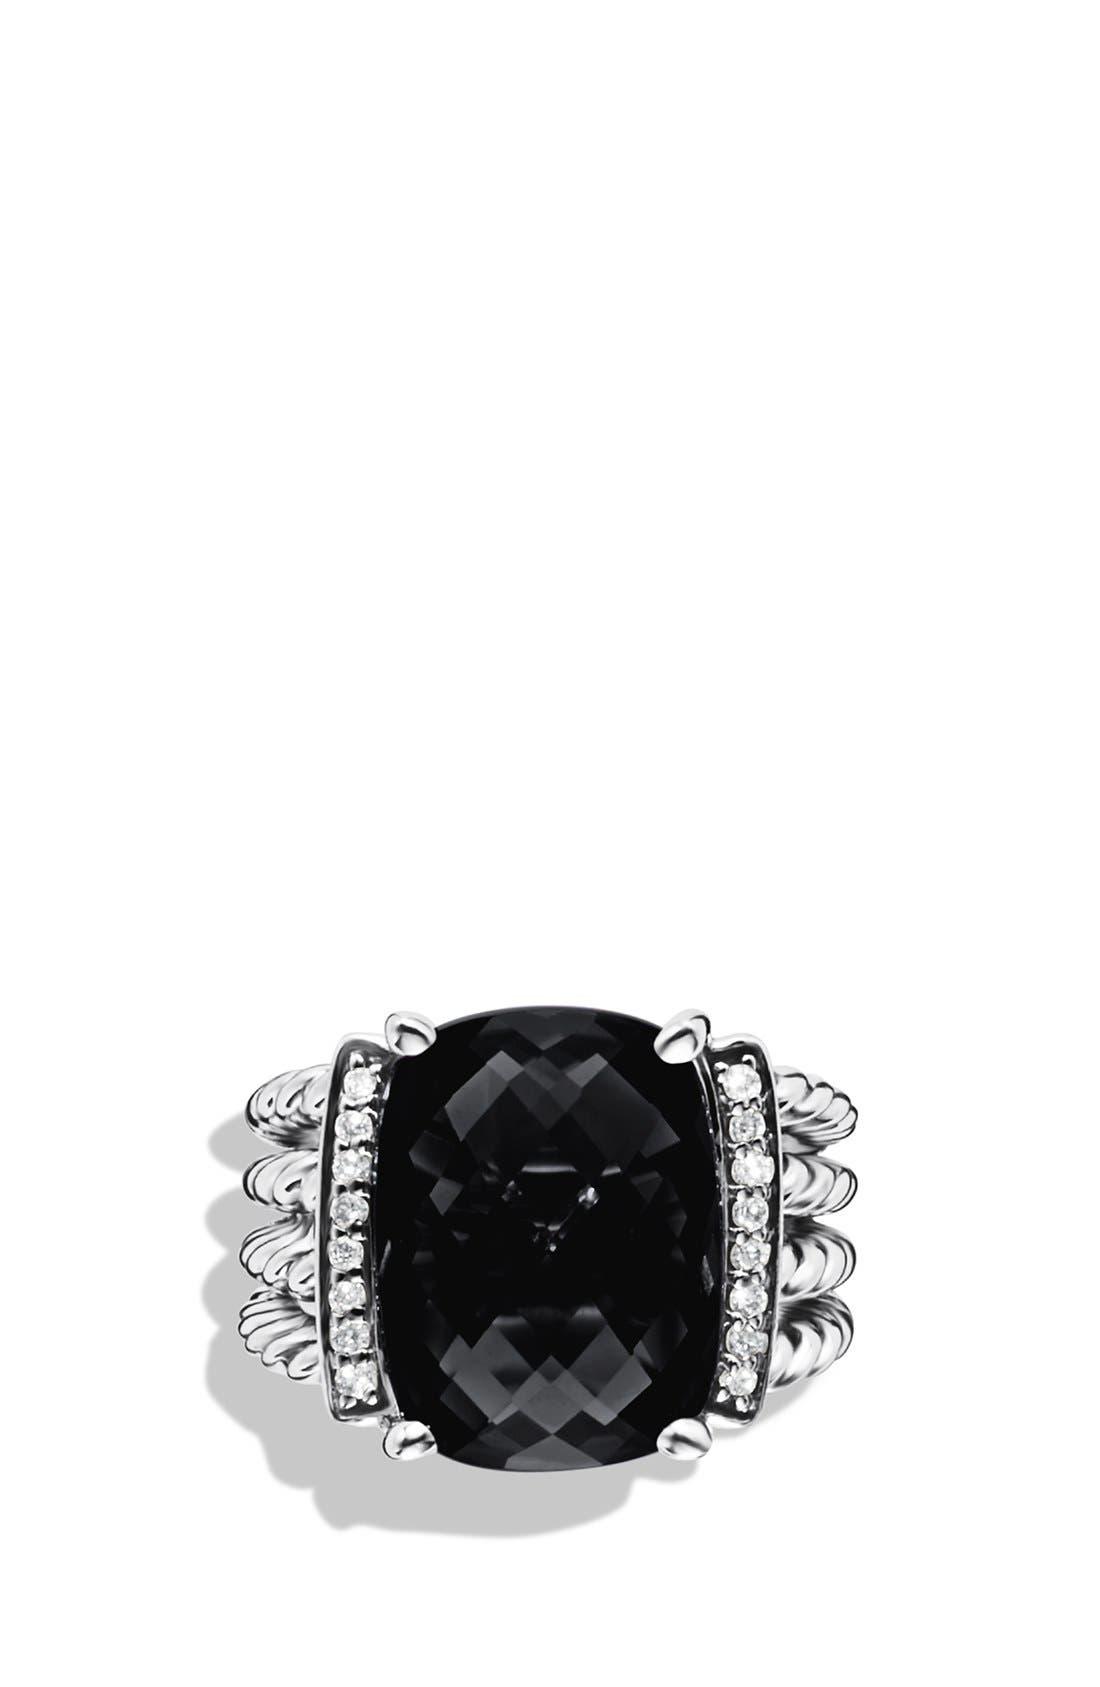 'Wheaton' Ring with Semiprecious Stone & Diamonds,                             Alternate thumbnail 5, color,                             BLACK ONYX